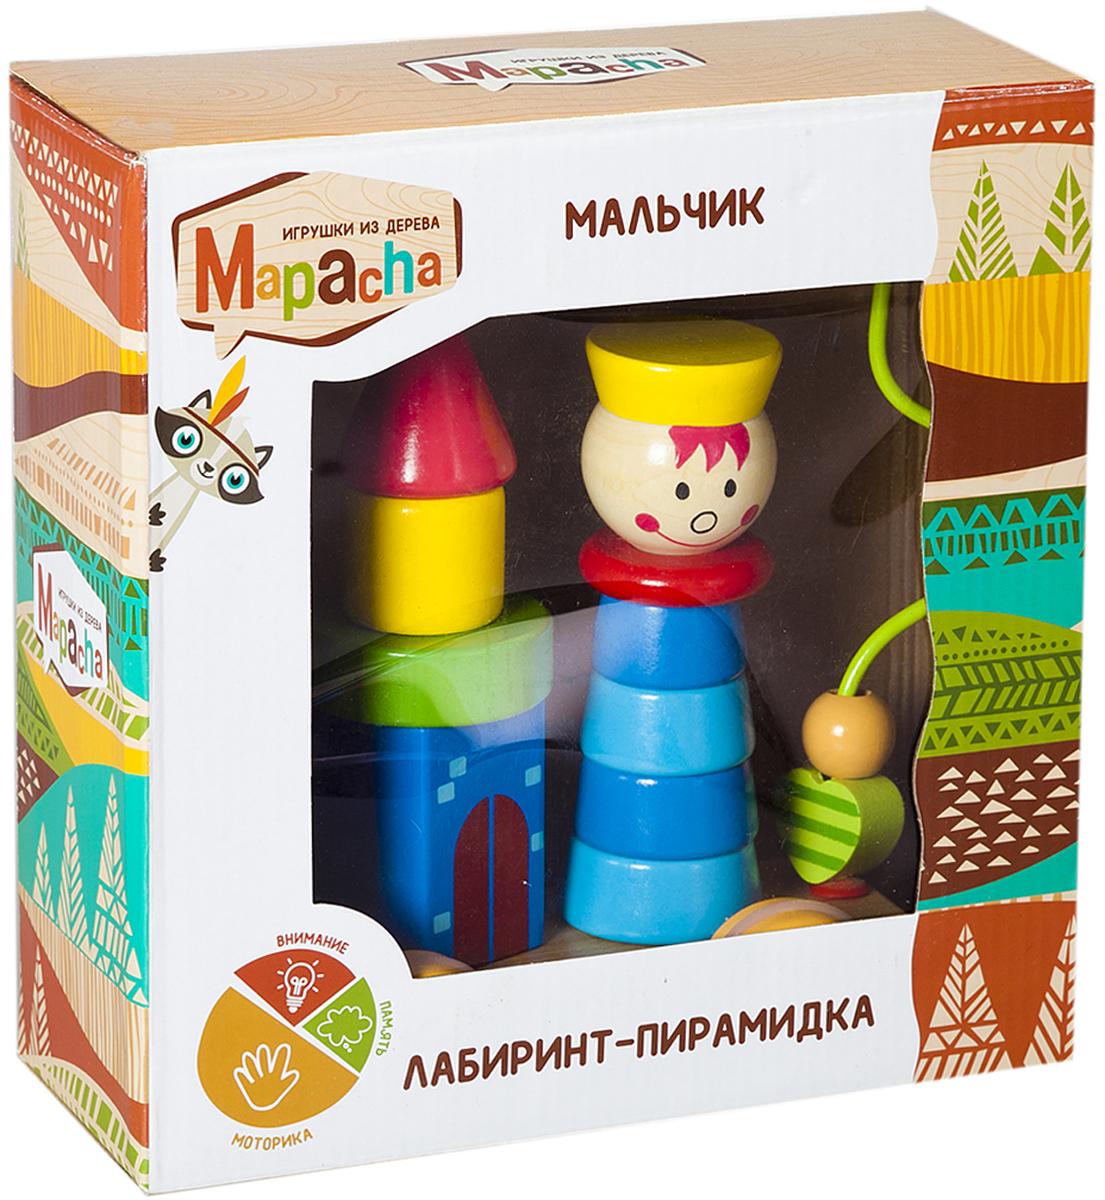 Mapacha Лабиринт-пирамидка Мальчик на колесиках mapacha лабиринт пирамидка мальчик на колесиках